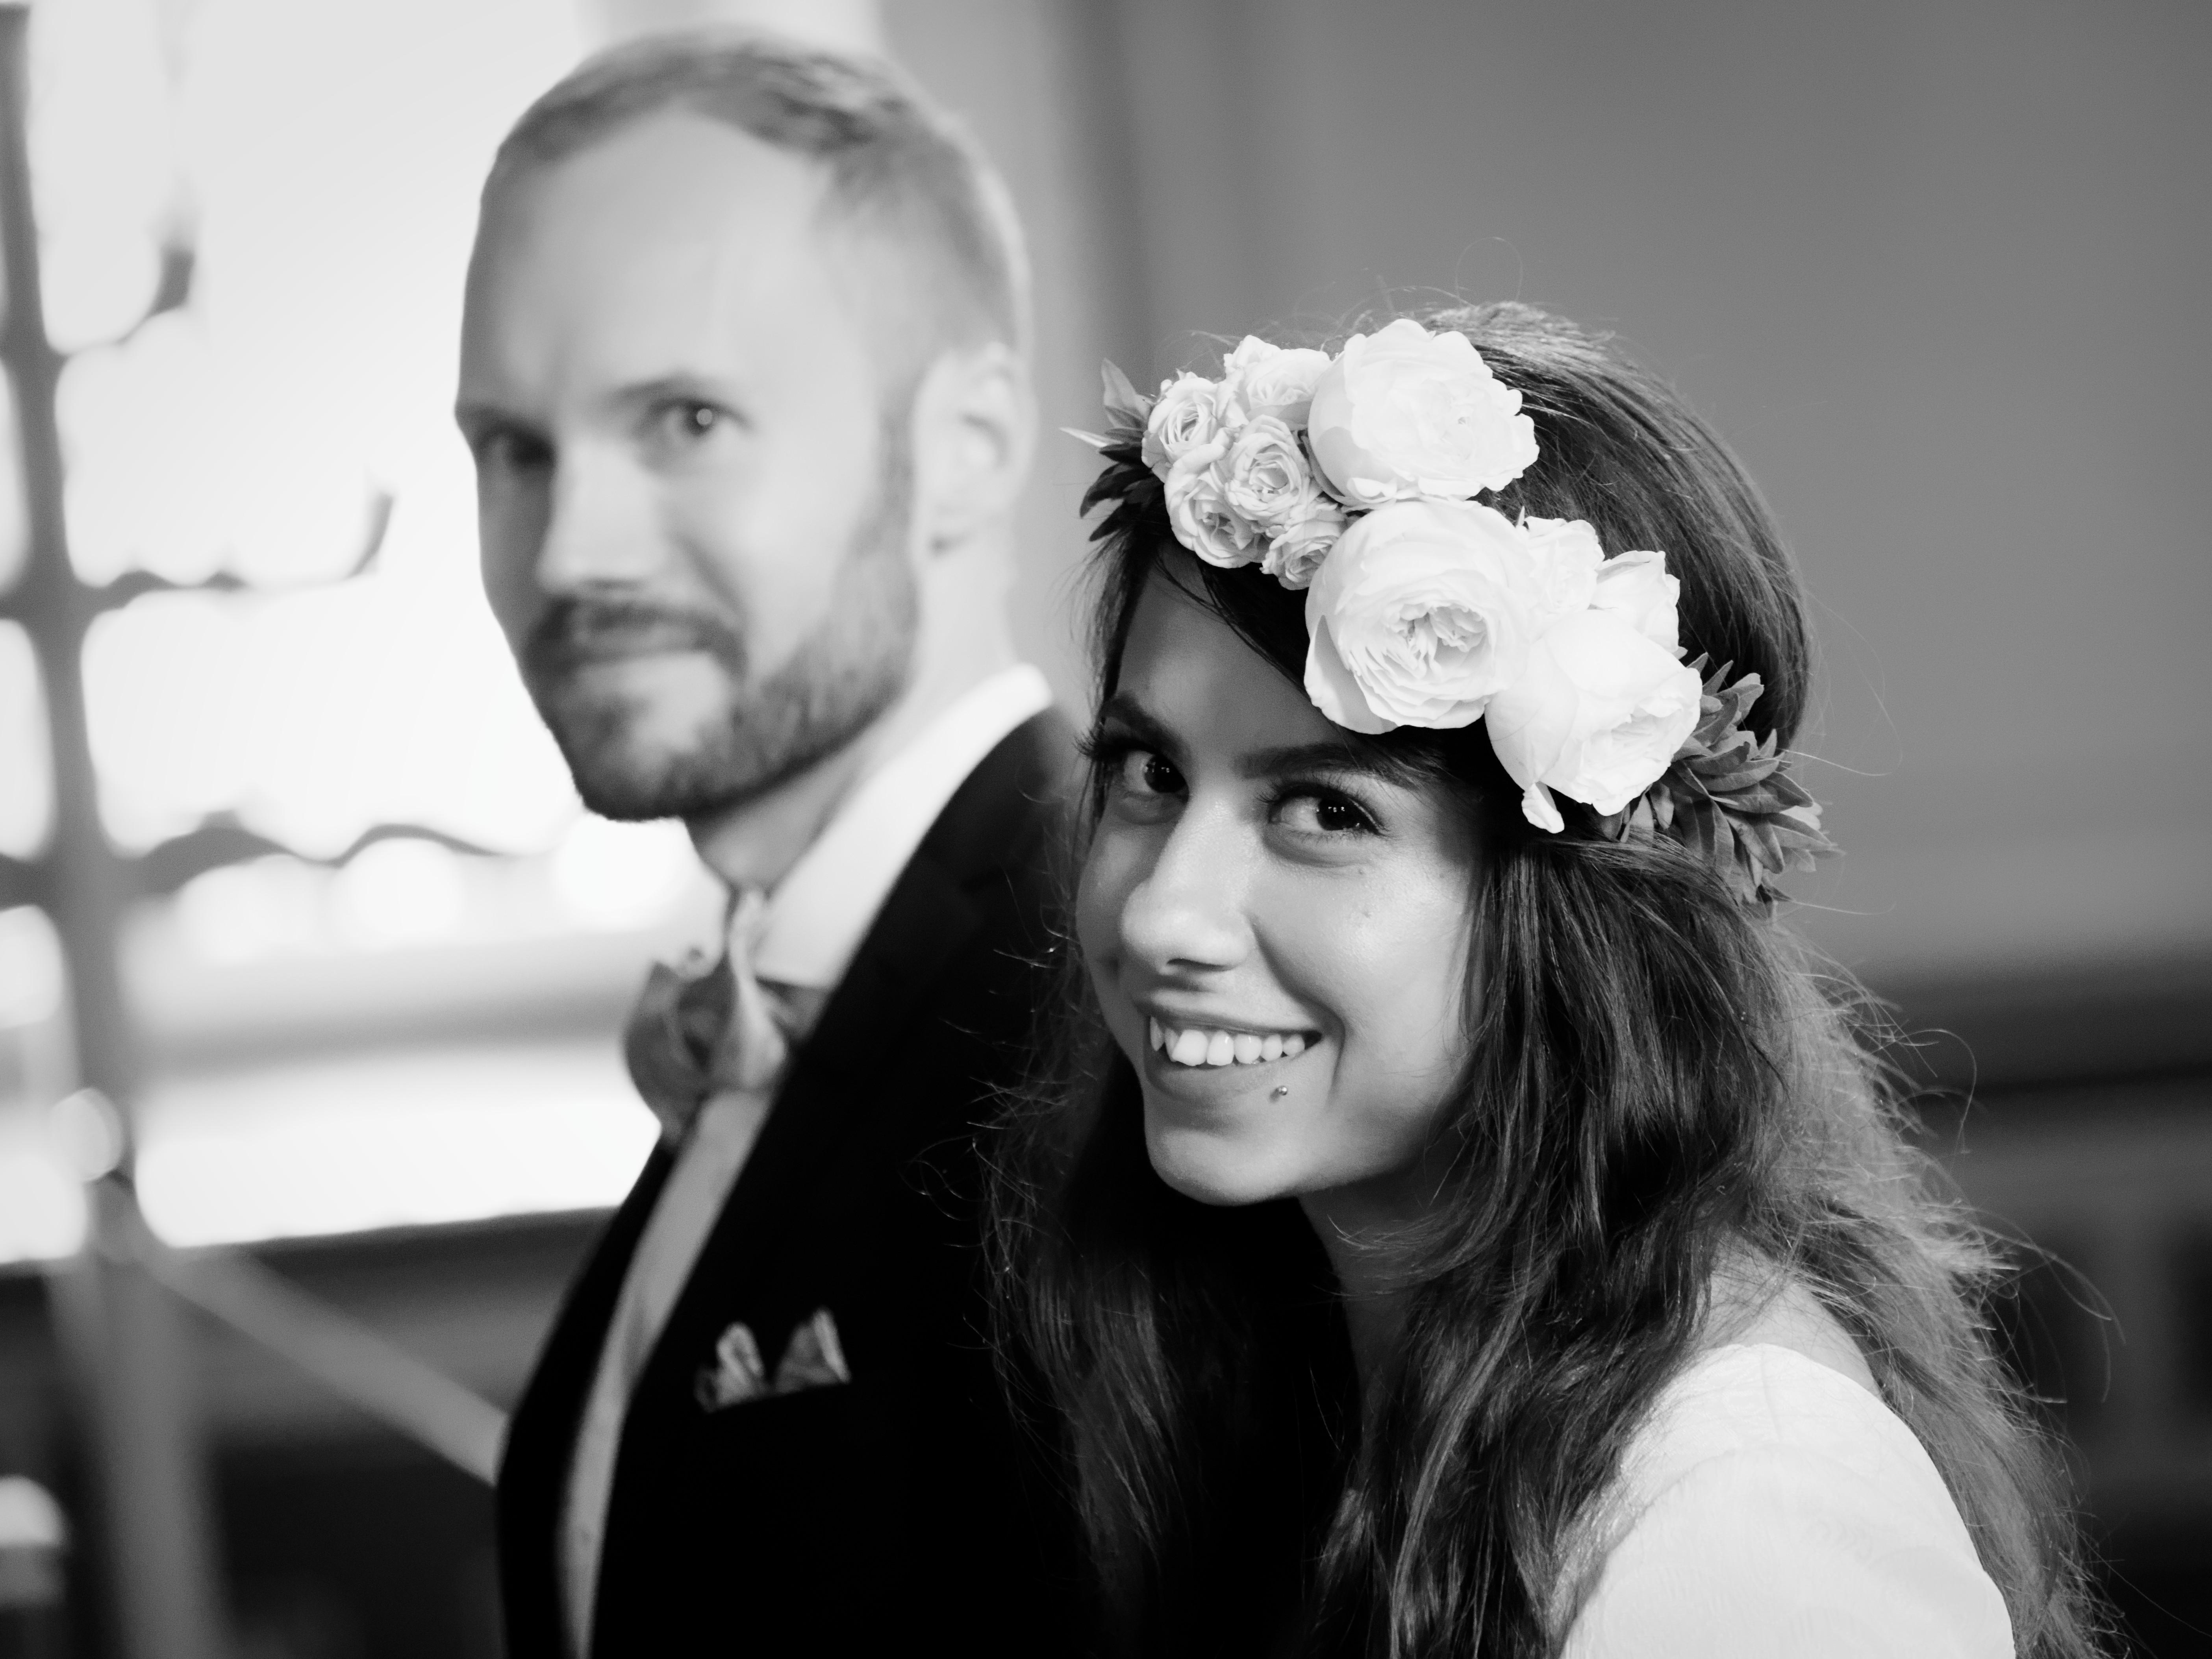 Bröllopsceremoni 2 - Mahdis & Tommy